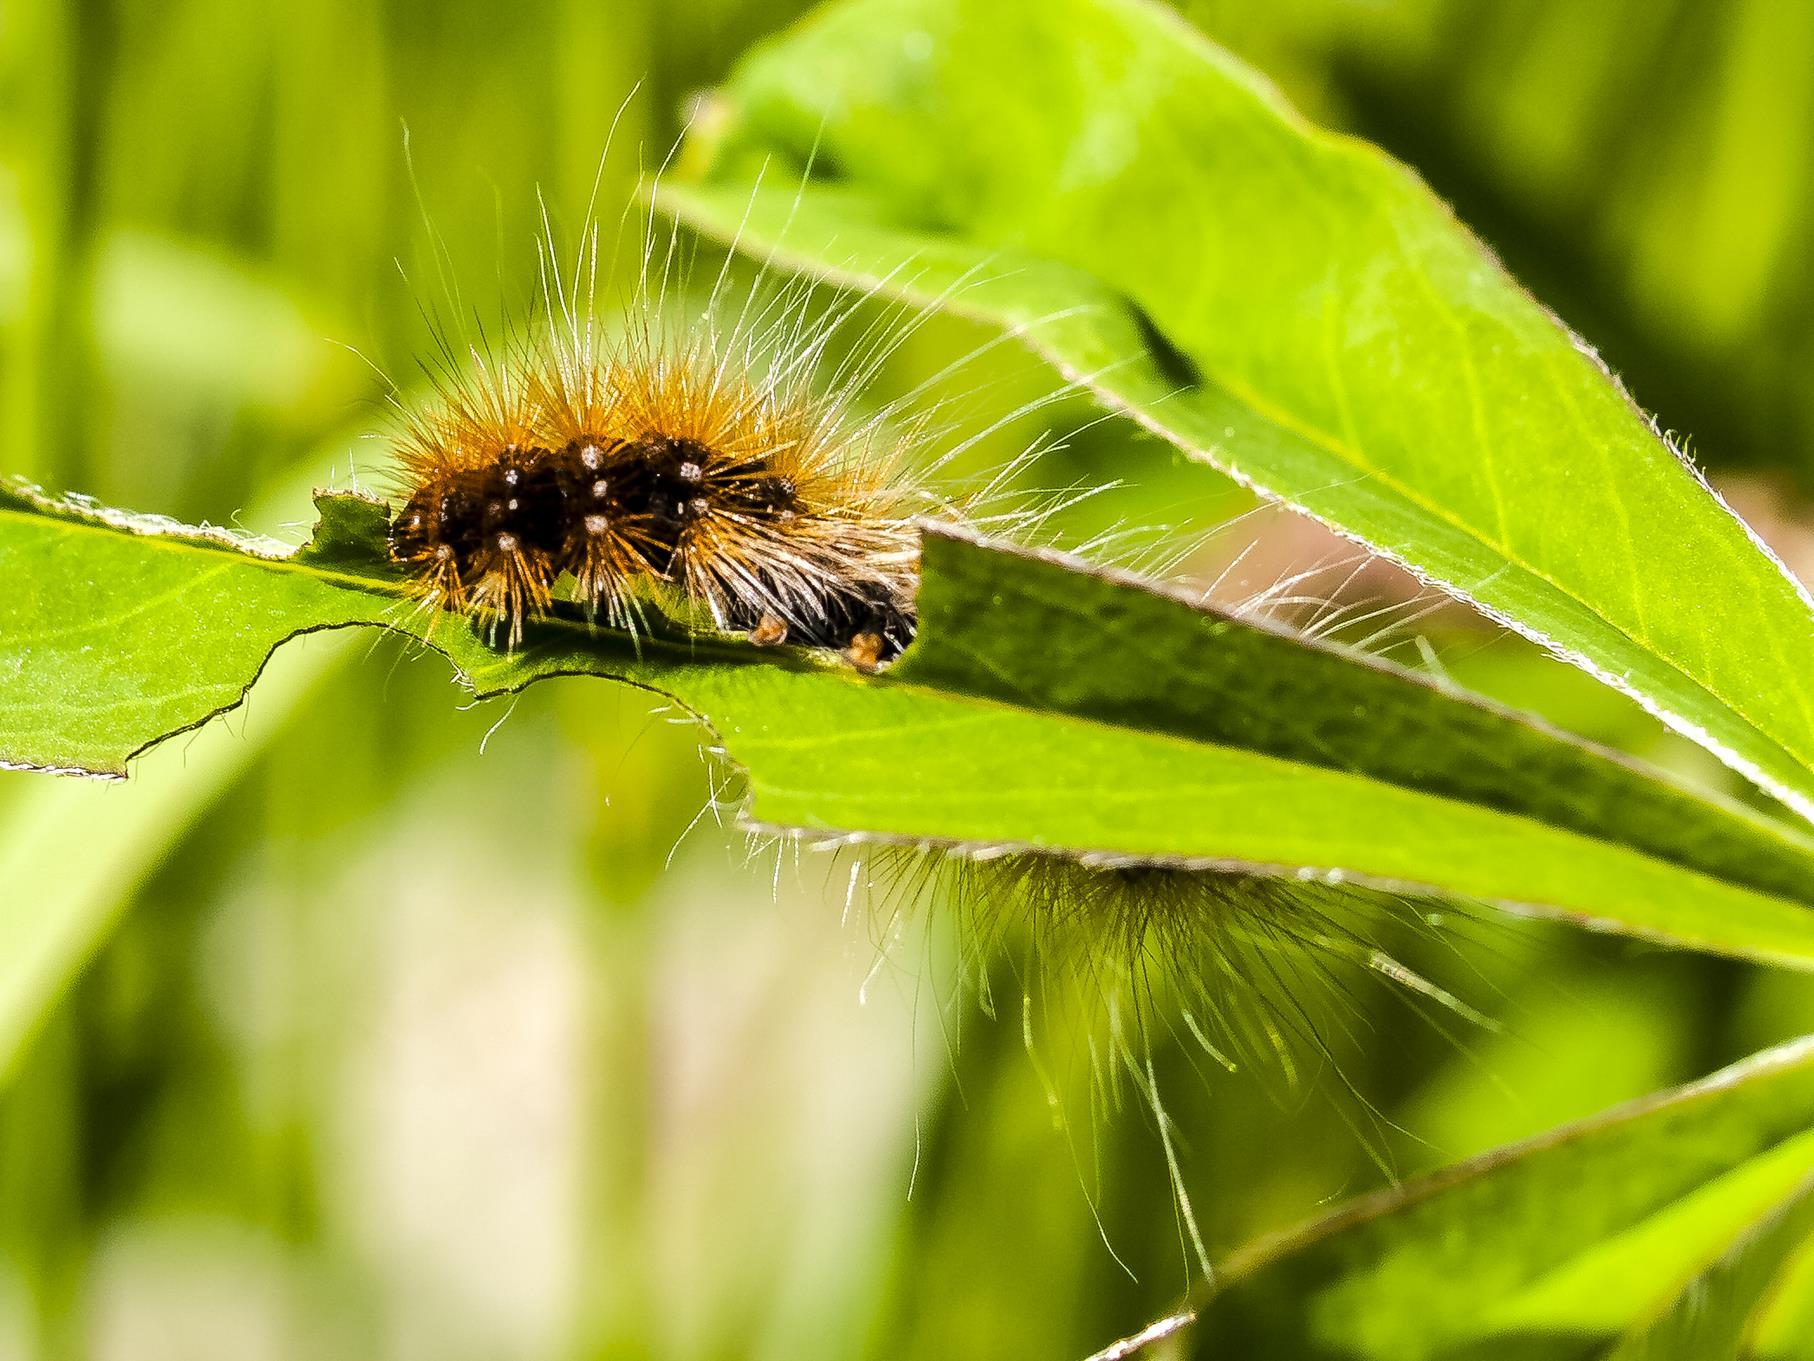 Eine haarige Raupe krabbelt entlang eines Blattes.